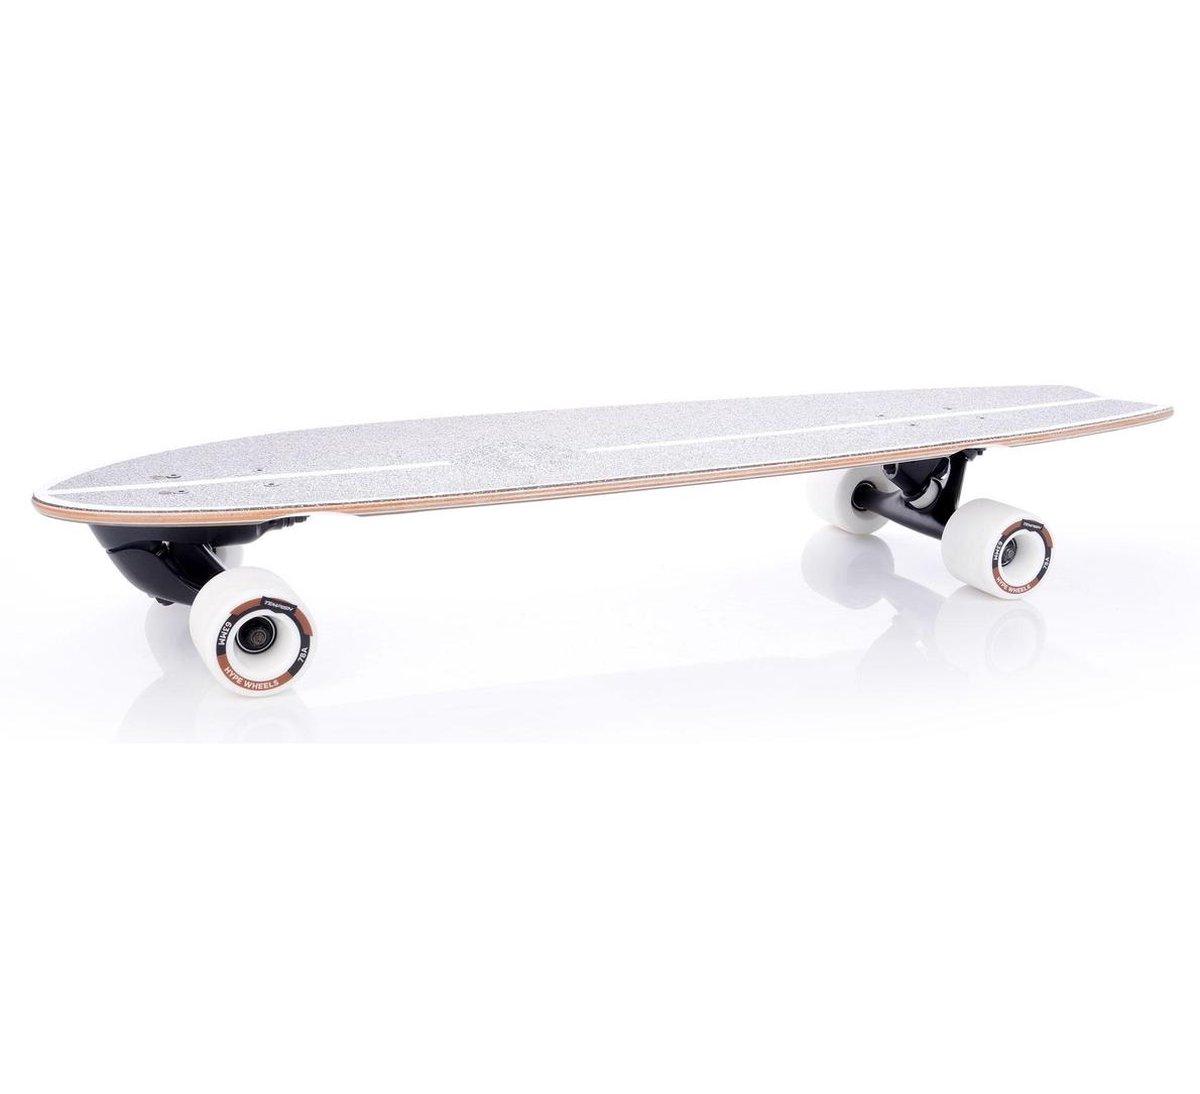 Tempish Longboard Surfy 82,5 X 23,5 Cm Wit/bruin